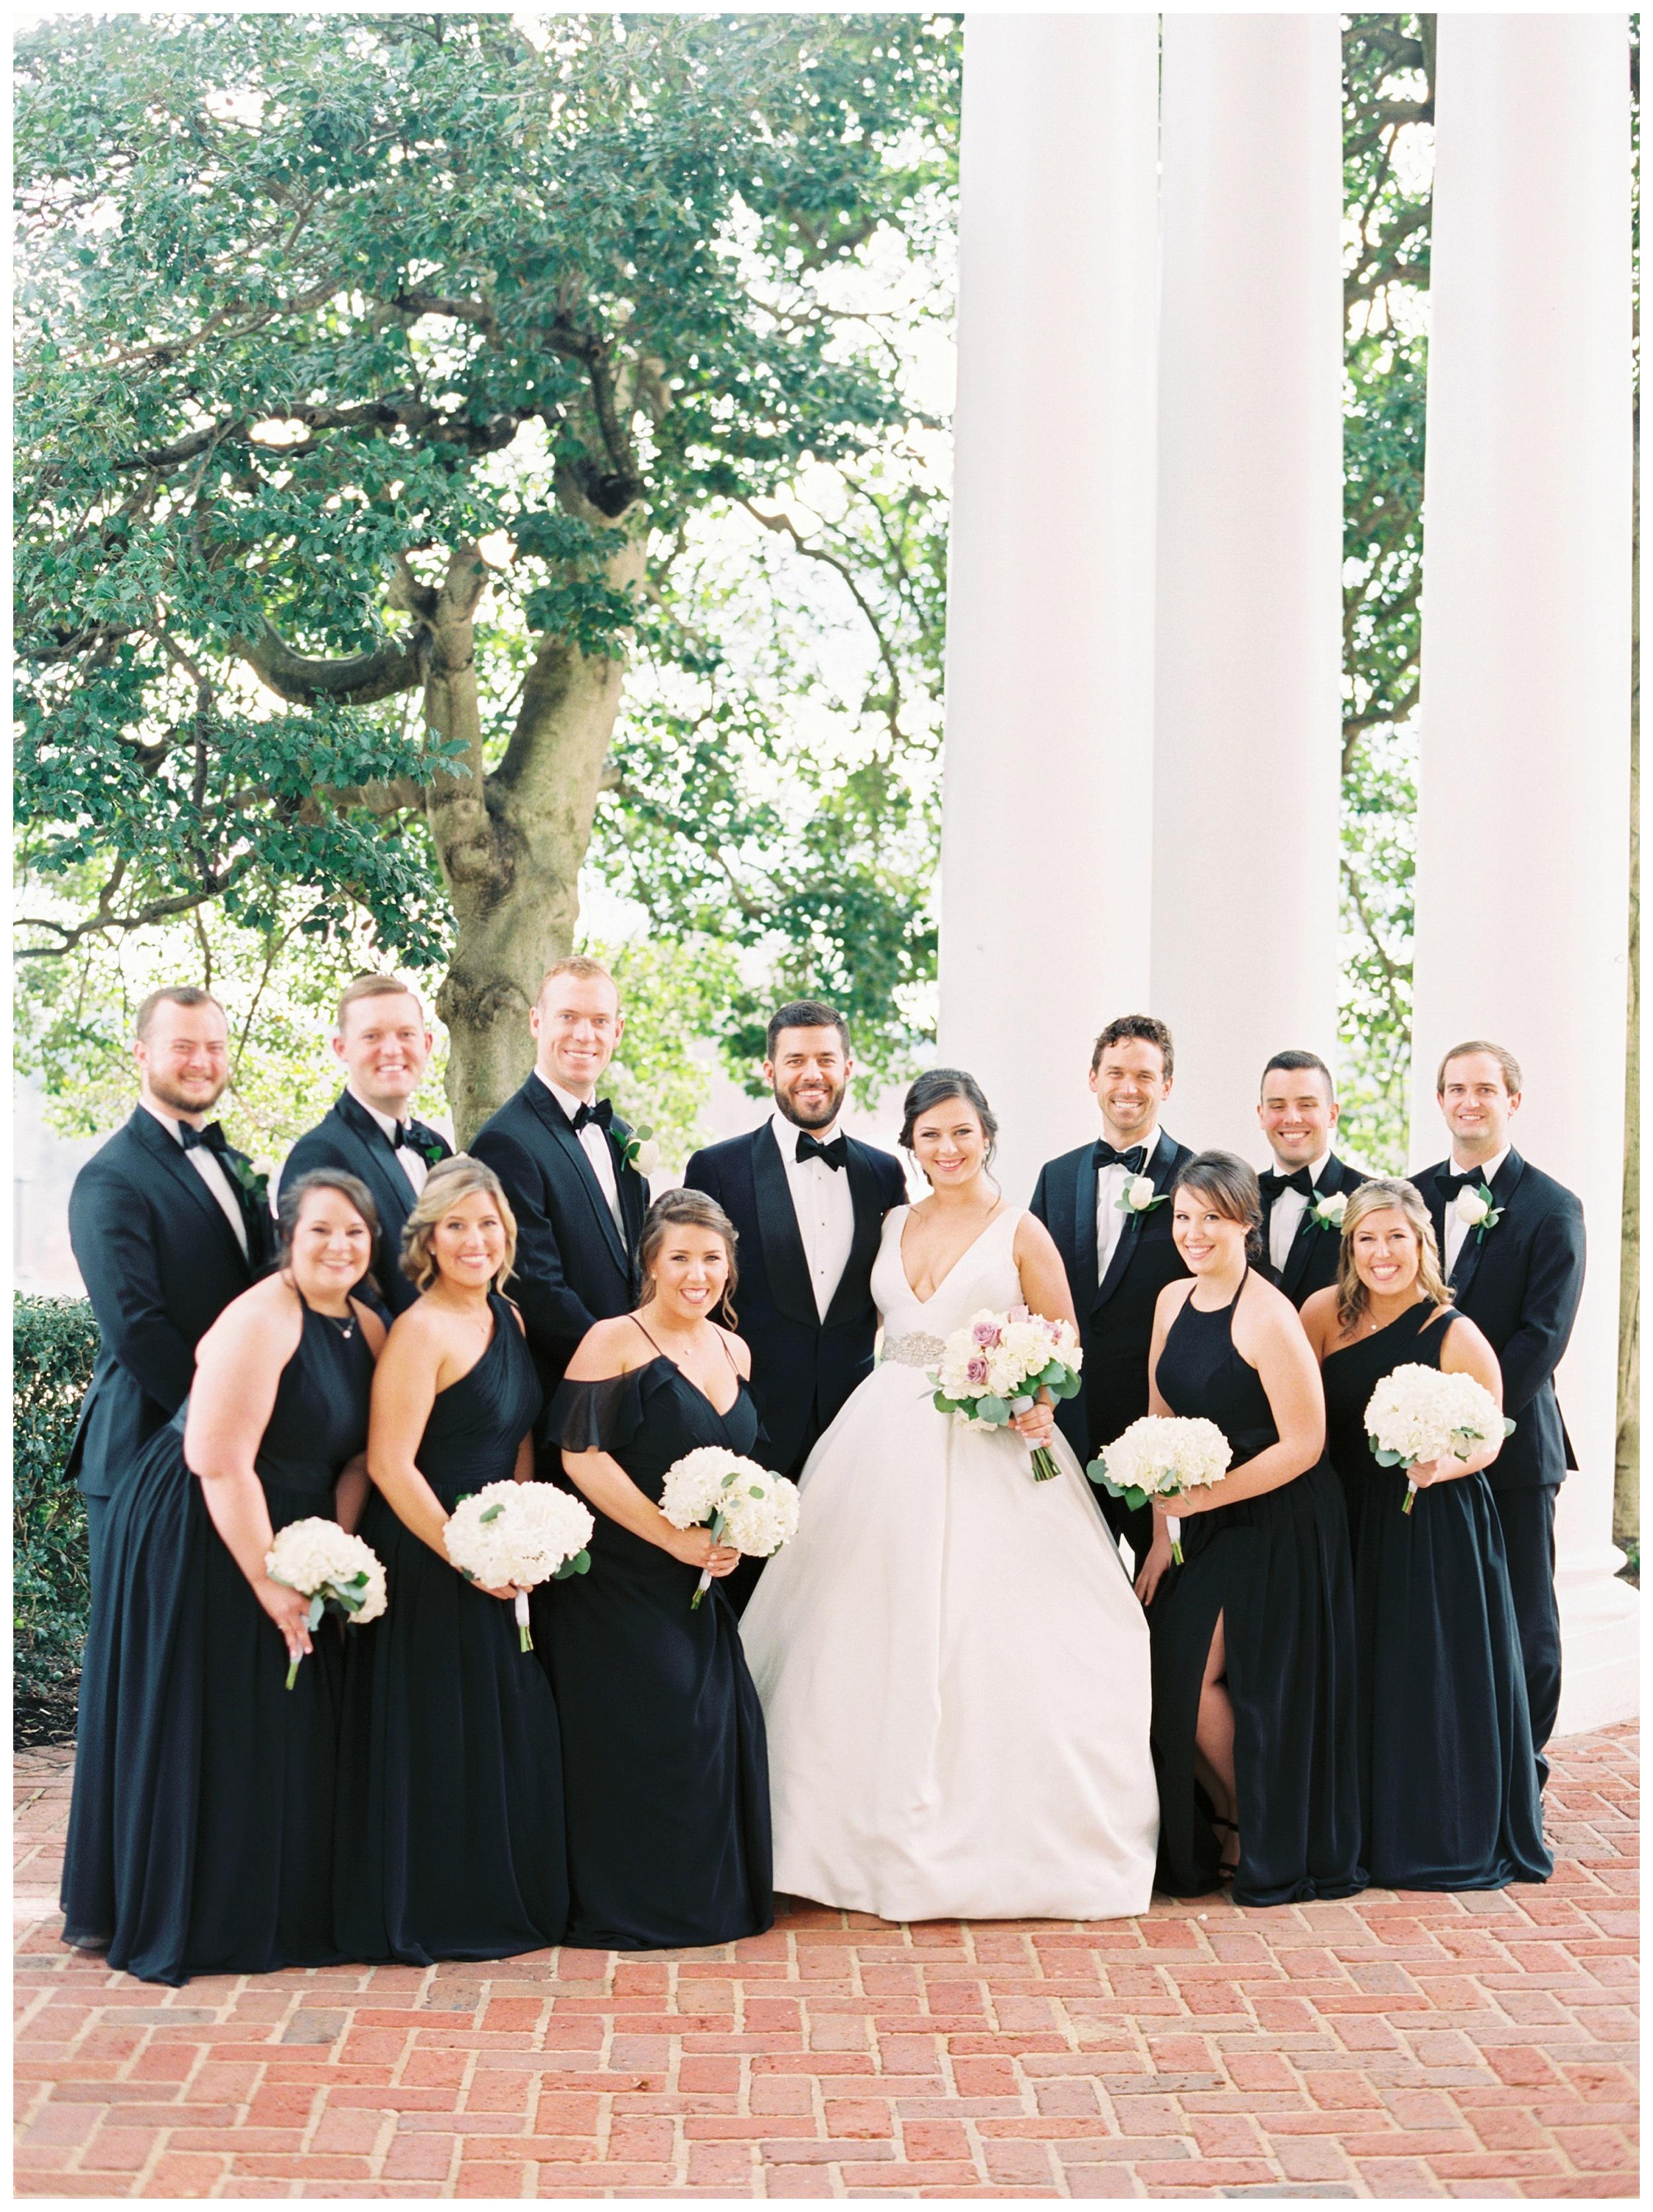 Country Club of Virginia Wedding | Richmond Wedding Photographer_0084.jpg